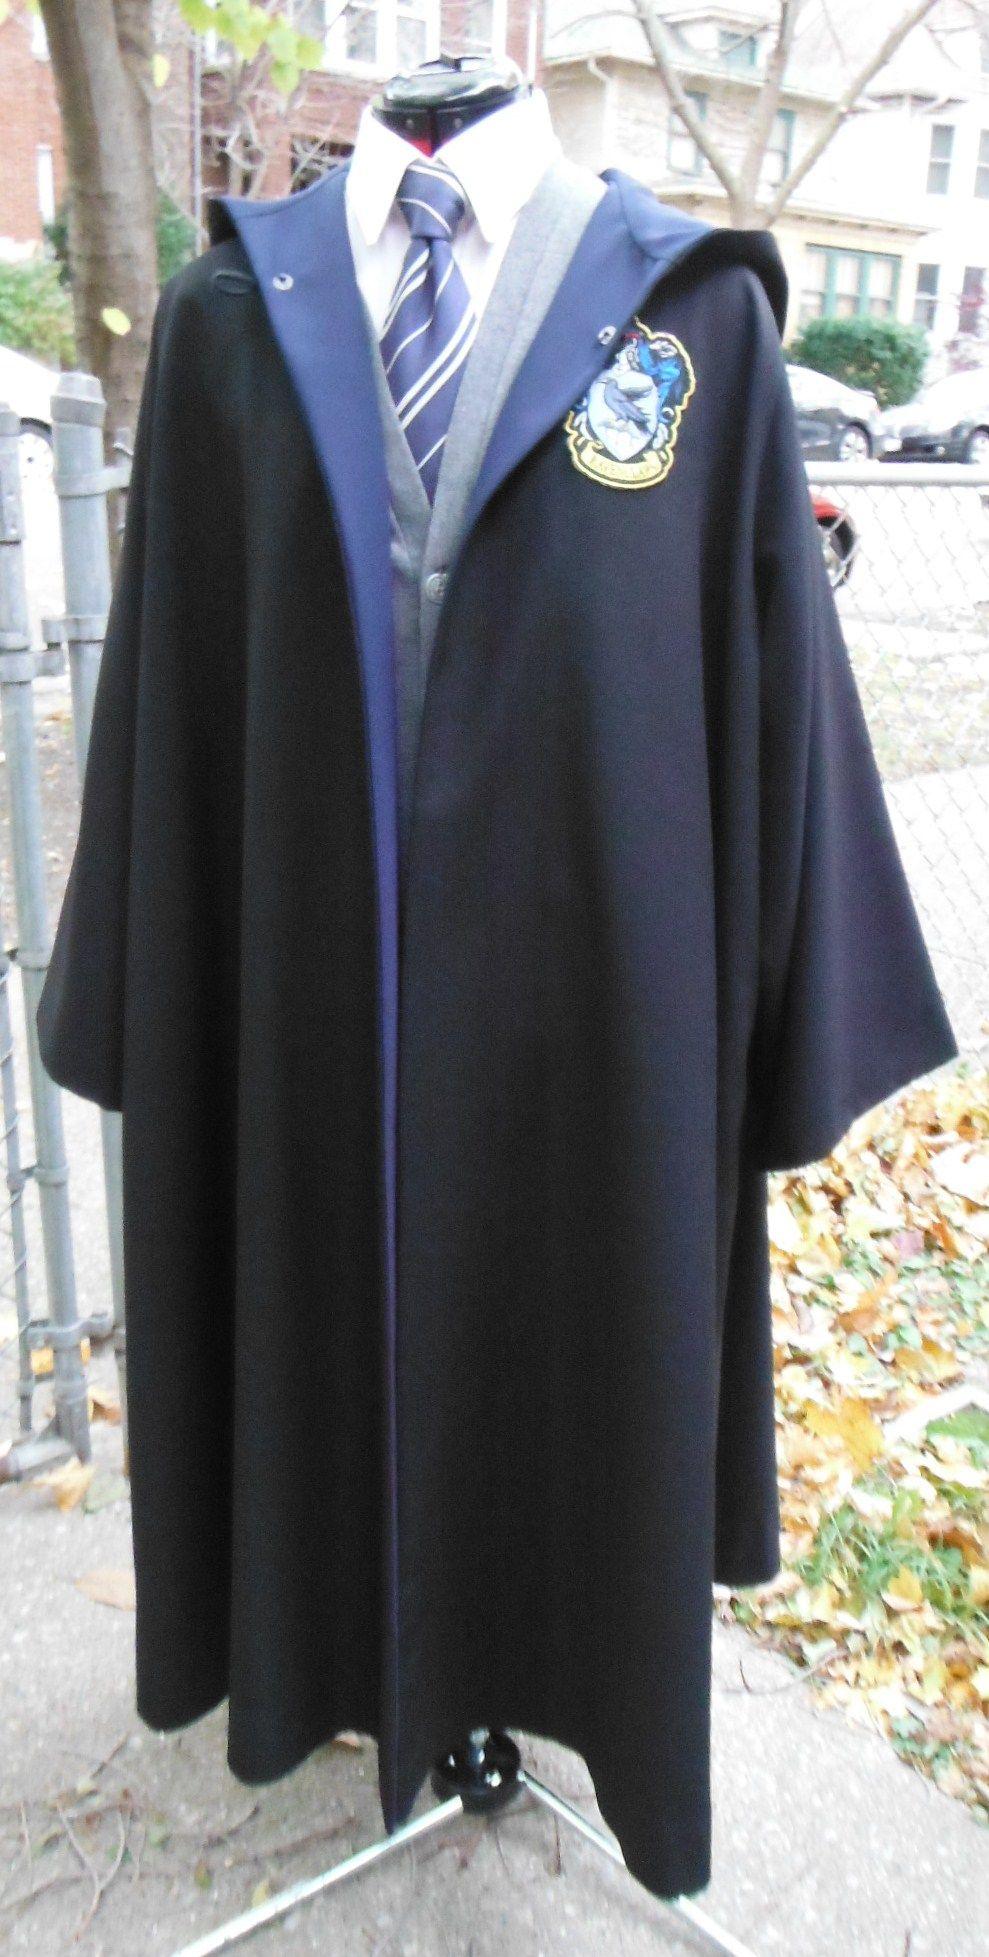 My Ravenclaw uniform | Hogwarts student uniforms | Pinterest ...